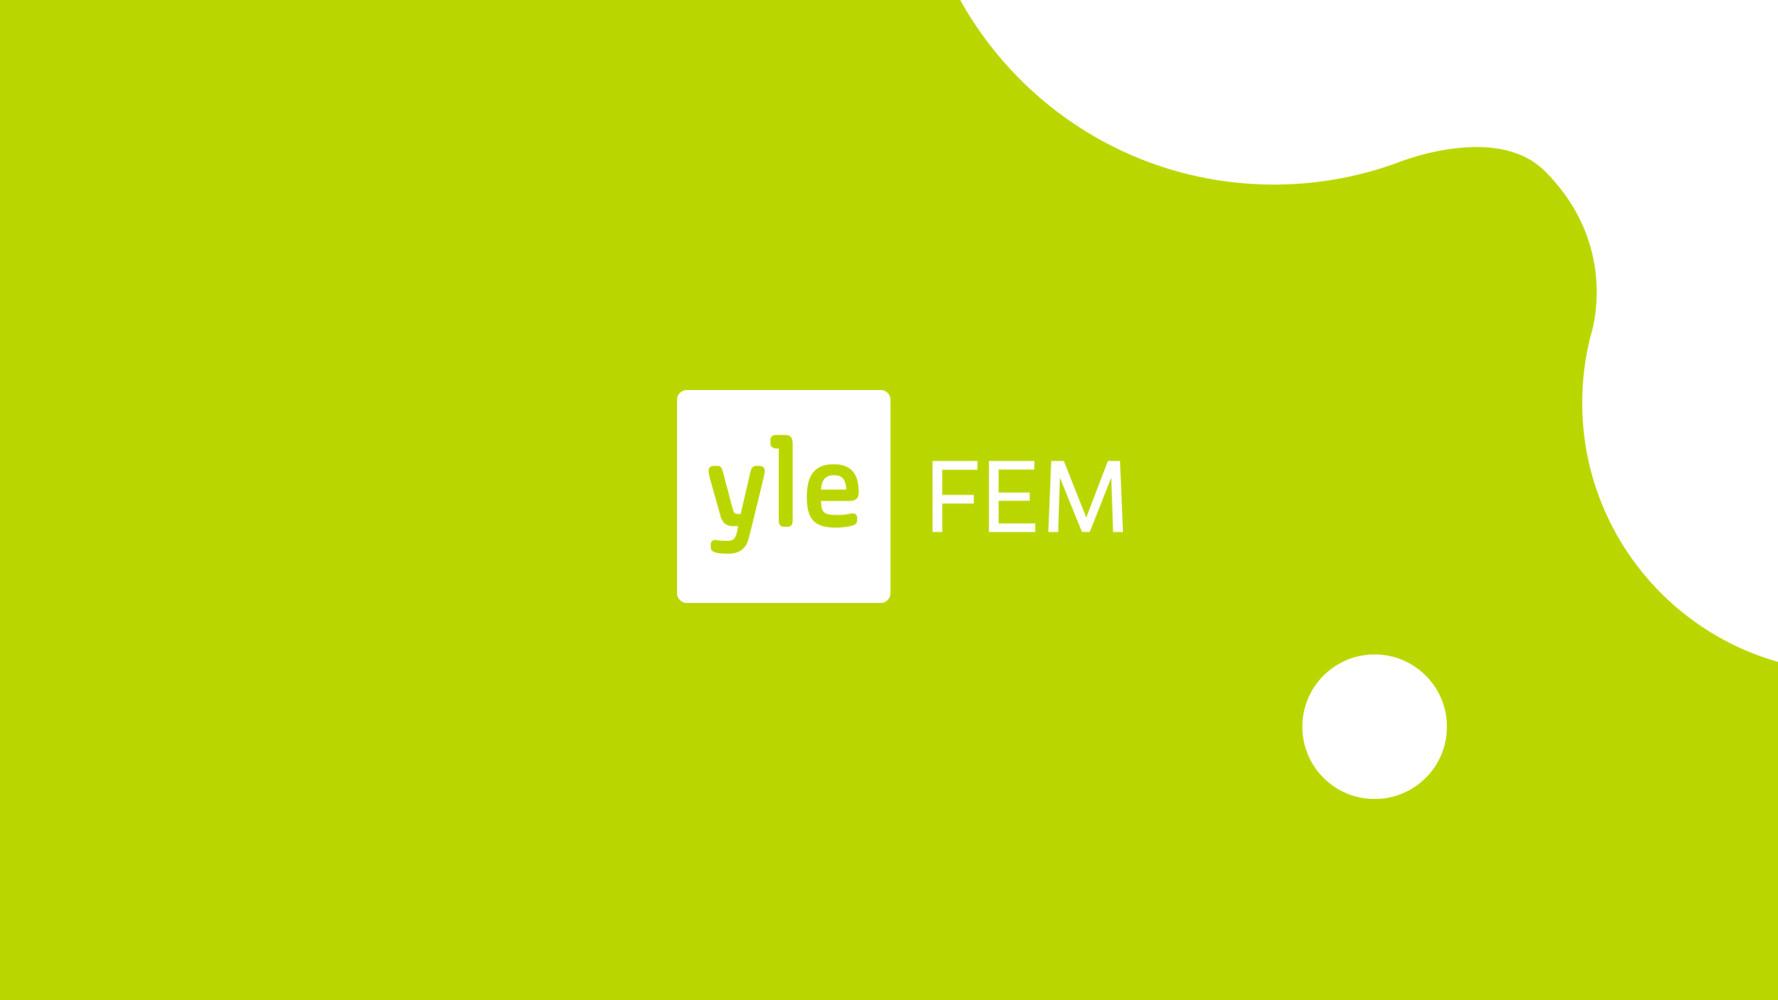 Yle Areena Fem